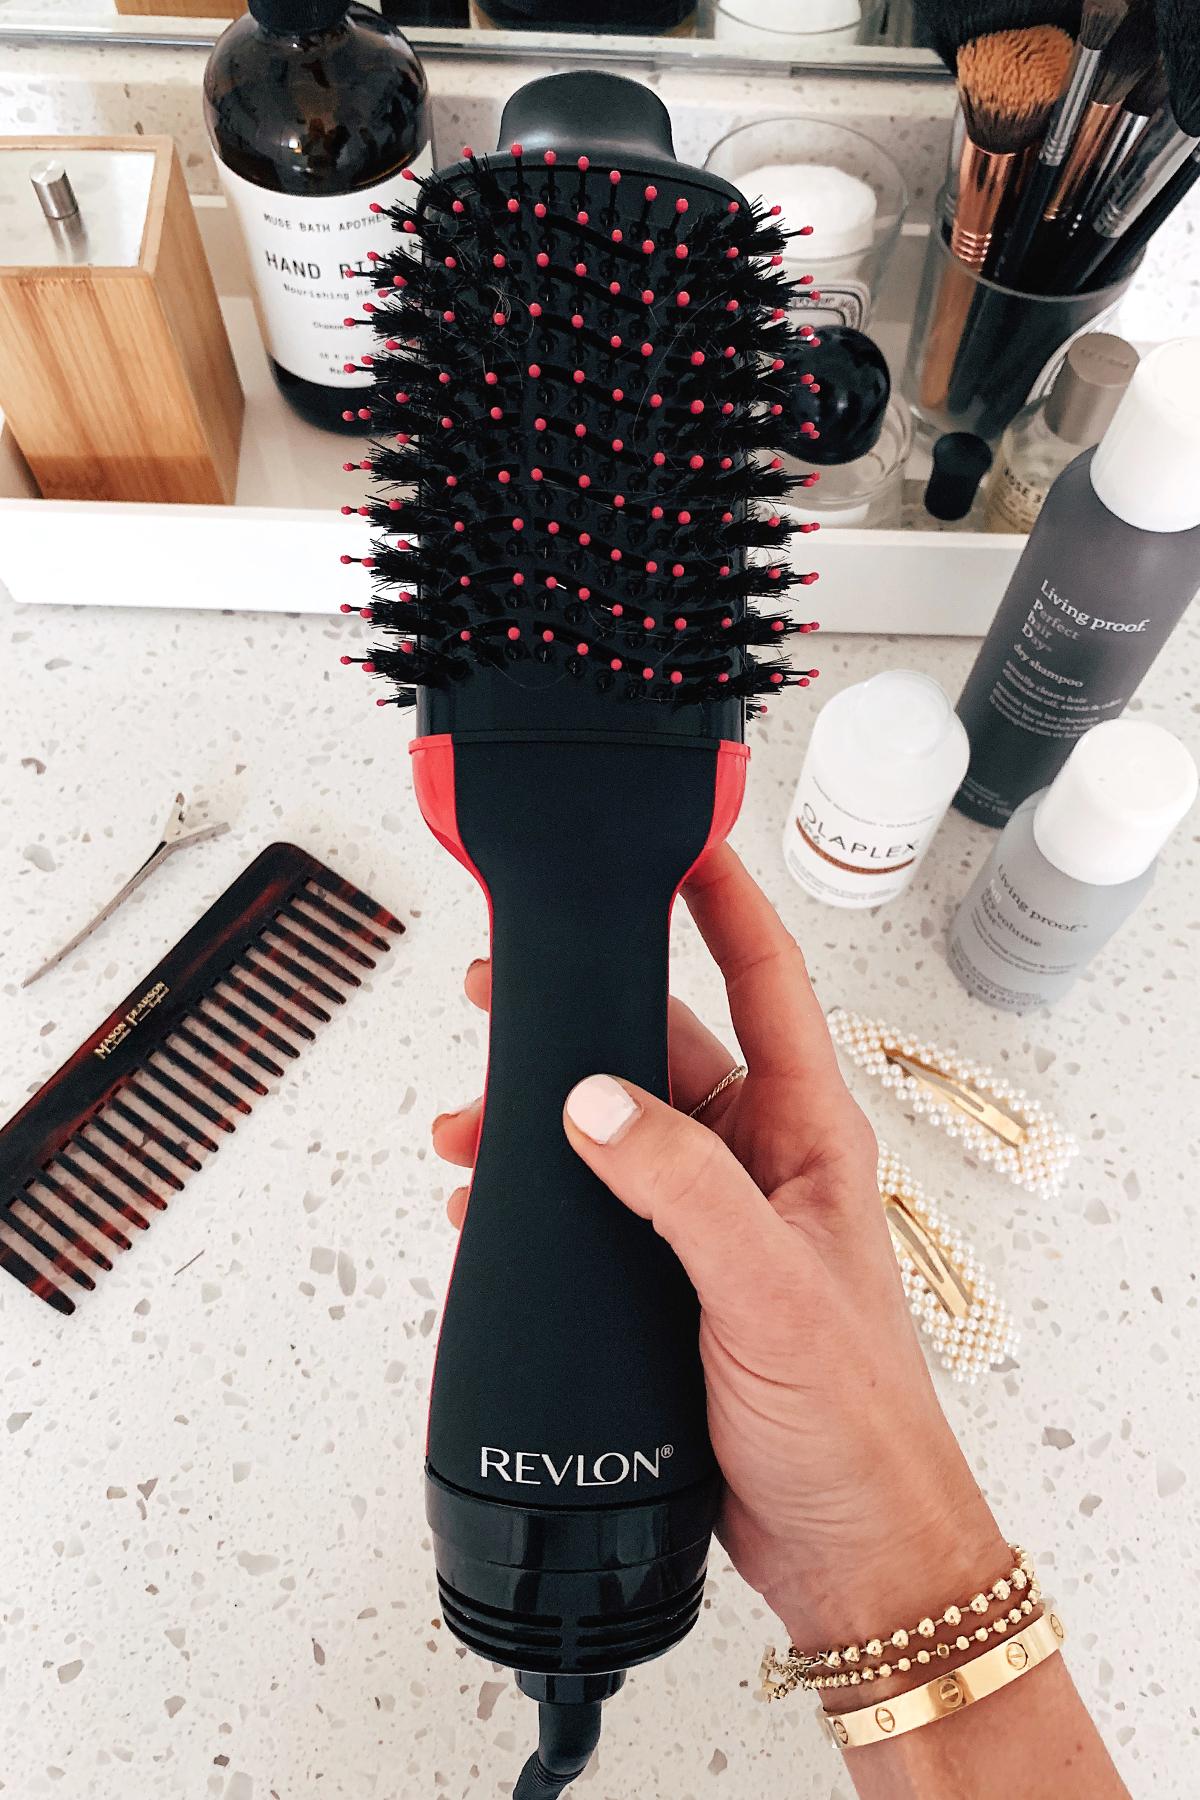 Fashion Jackson Revlon Hair Dryer and Volumizer